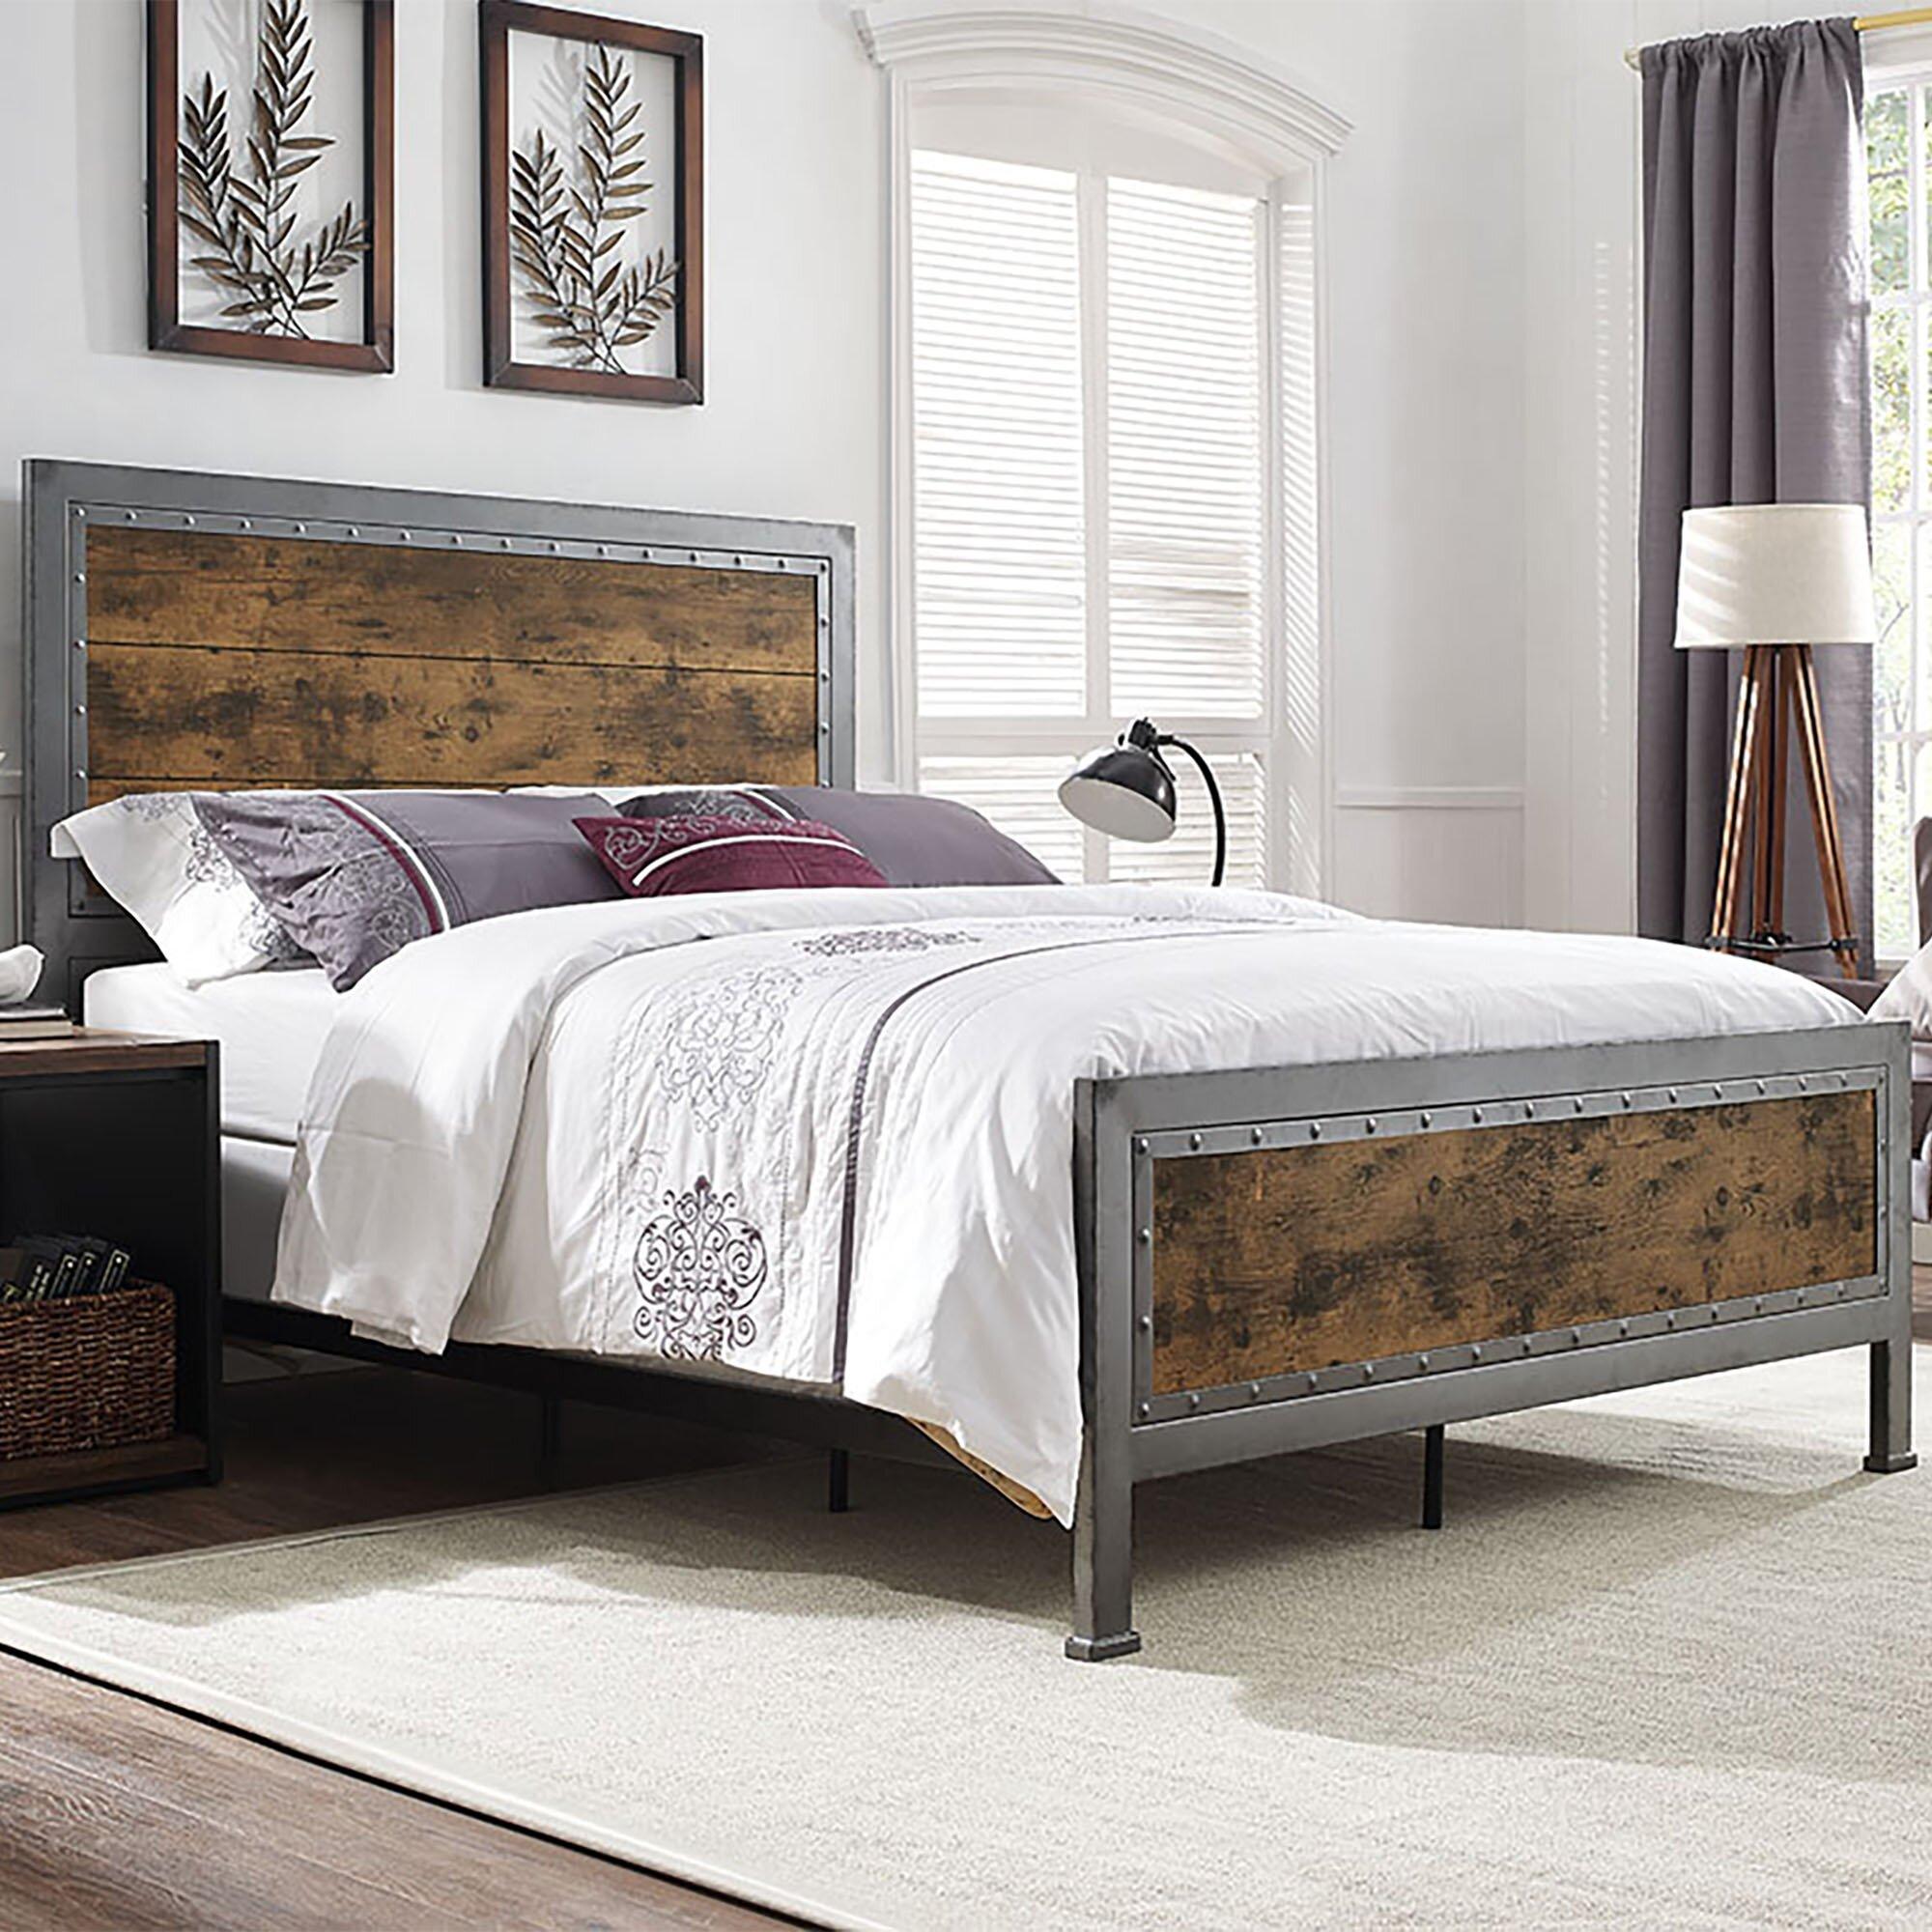 trent austin design tonkawa industrial wood and metal queen bed - Bed Frames Austin